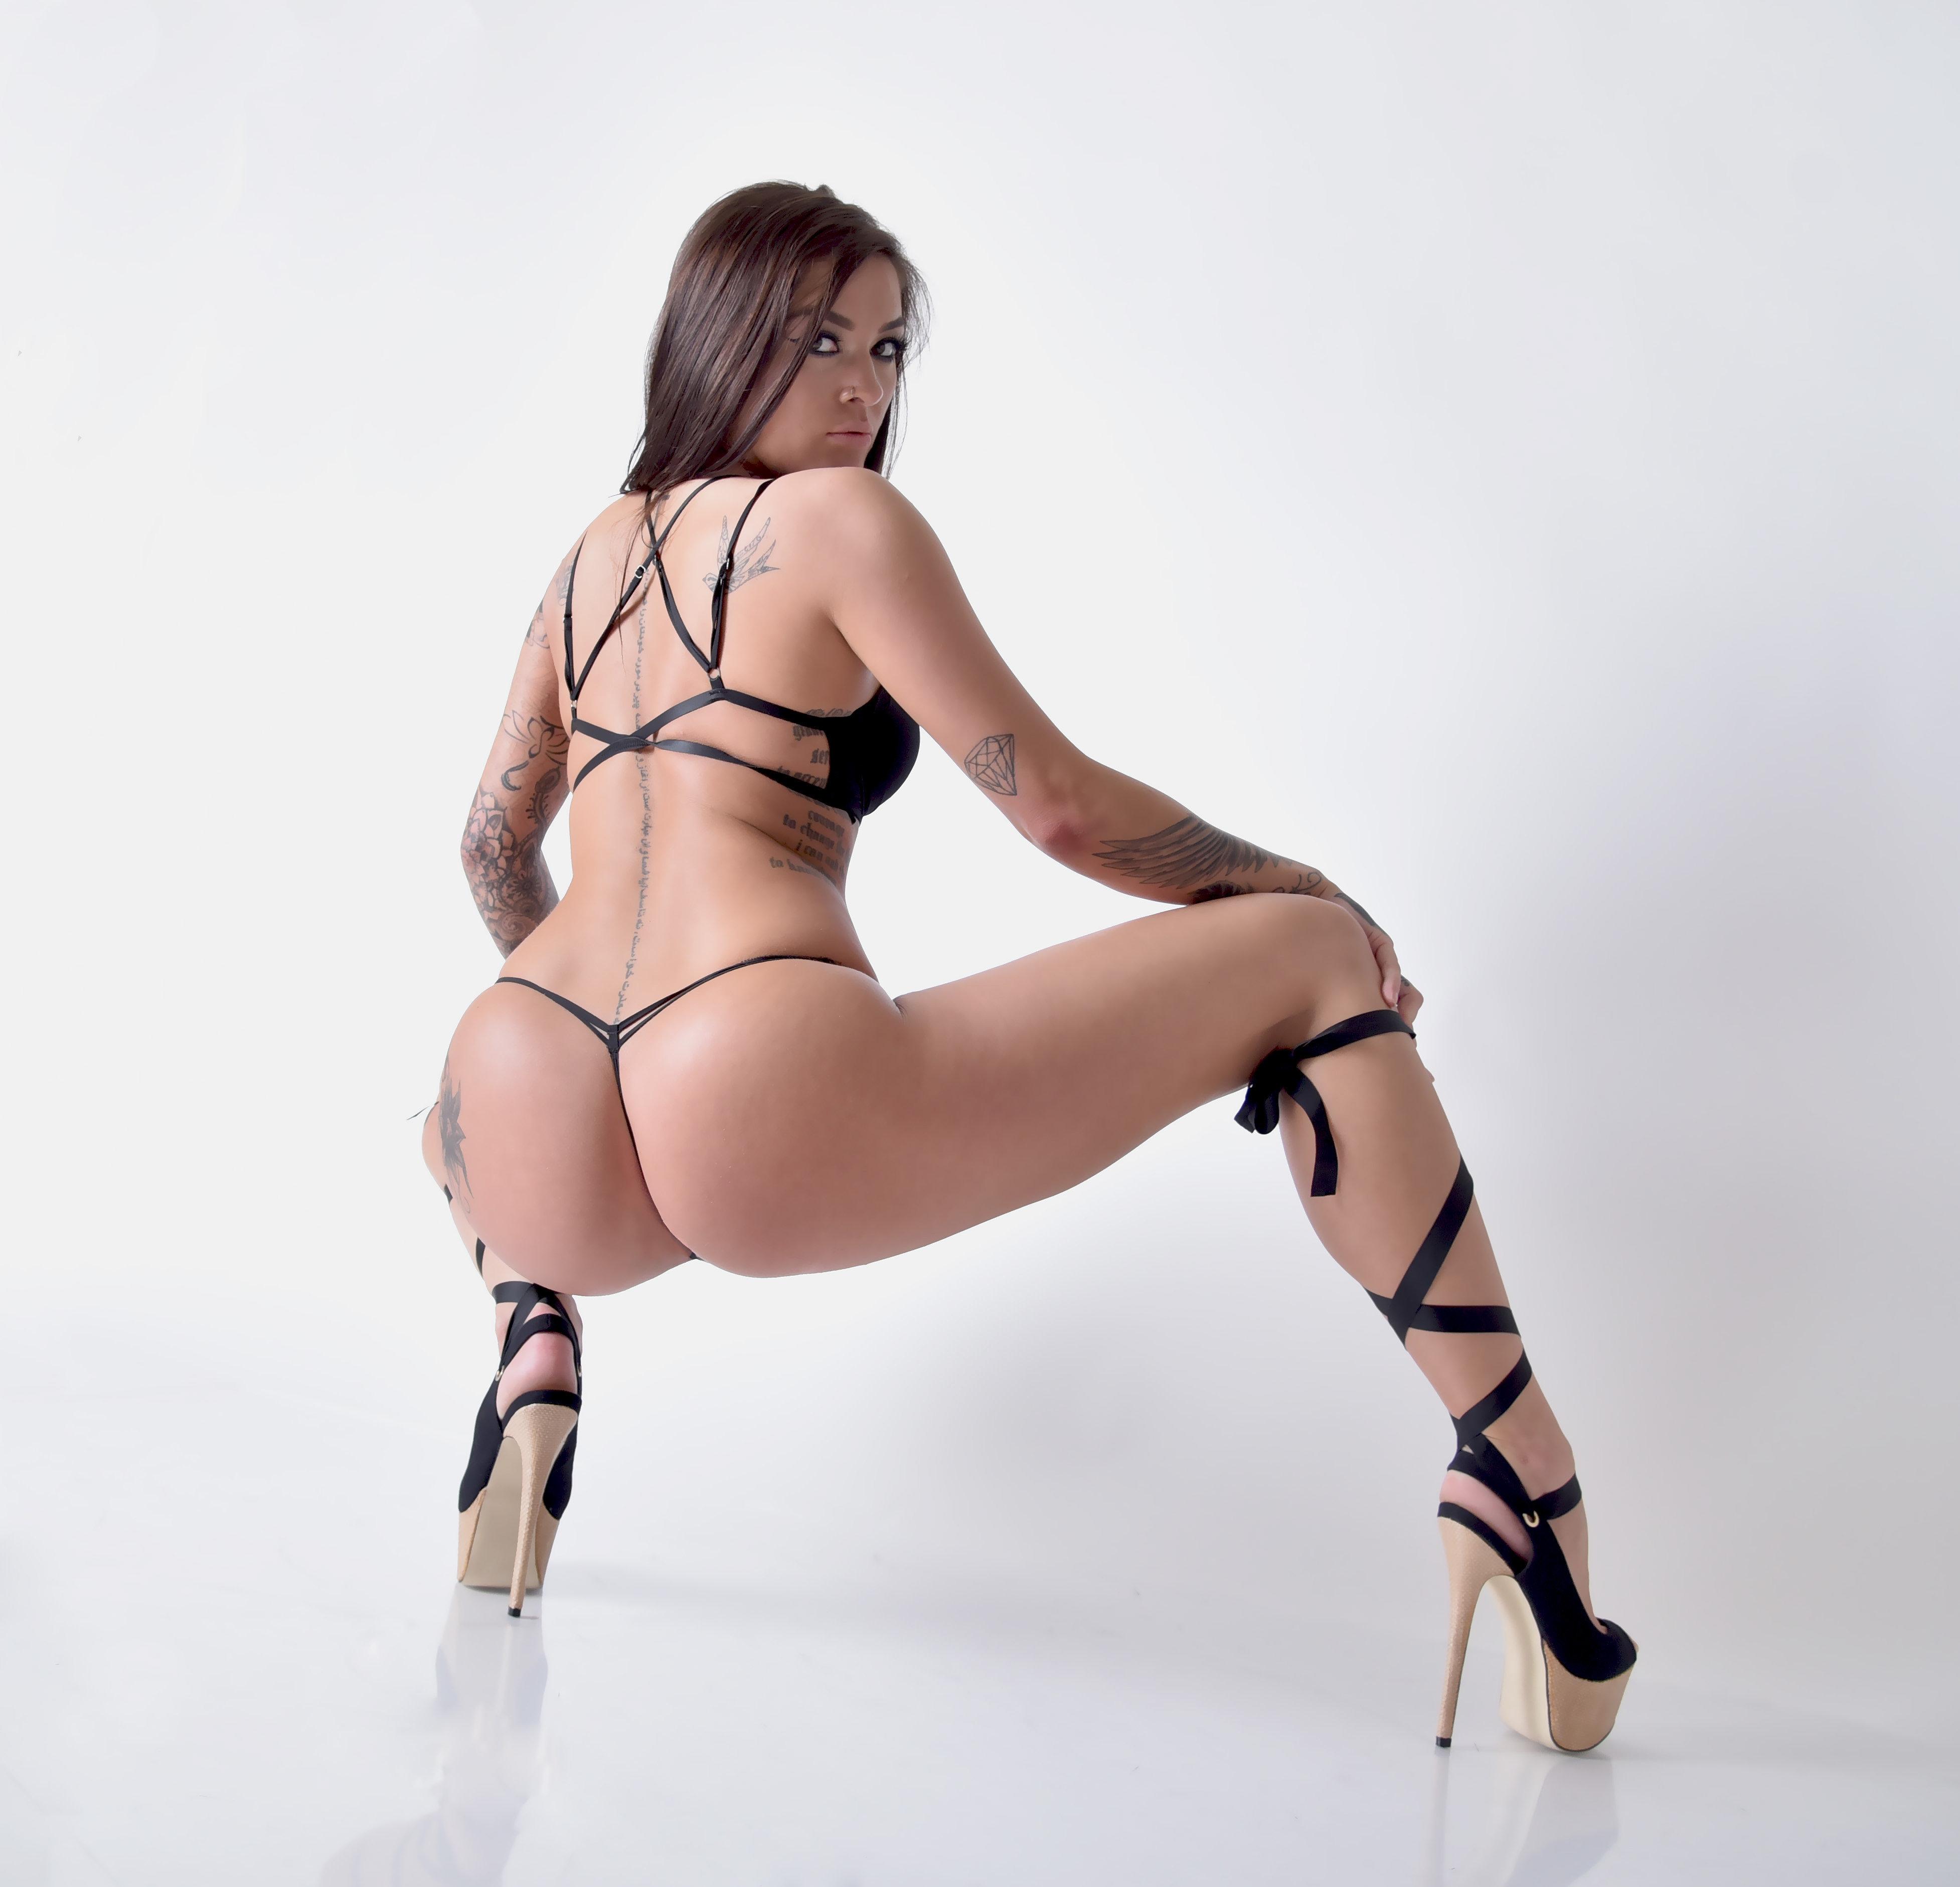 Exotic dancers escorts What do escorts do?, Skip the games